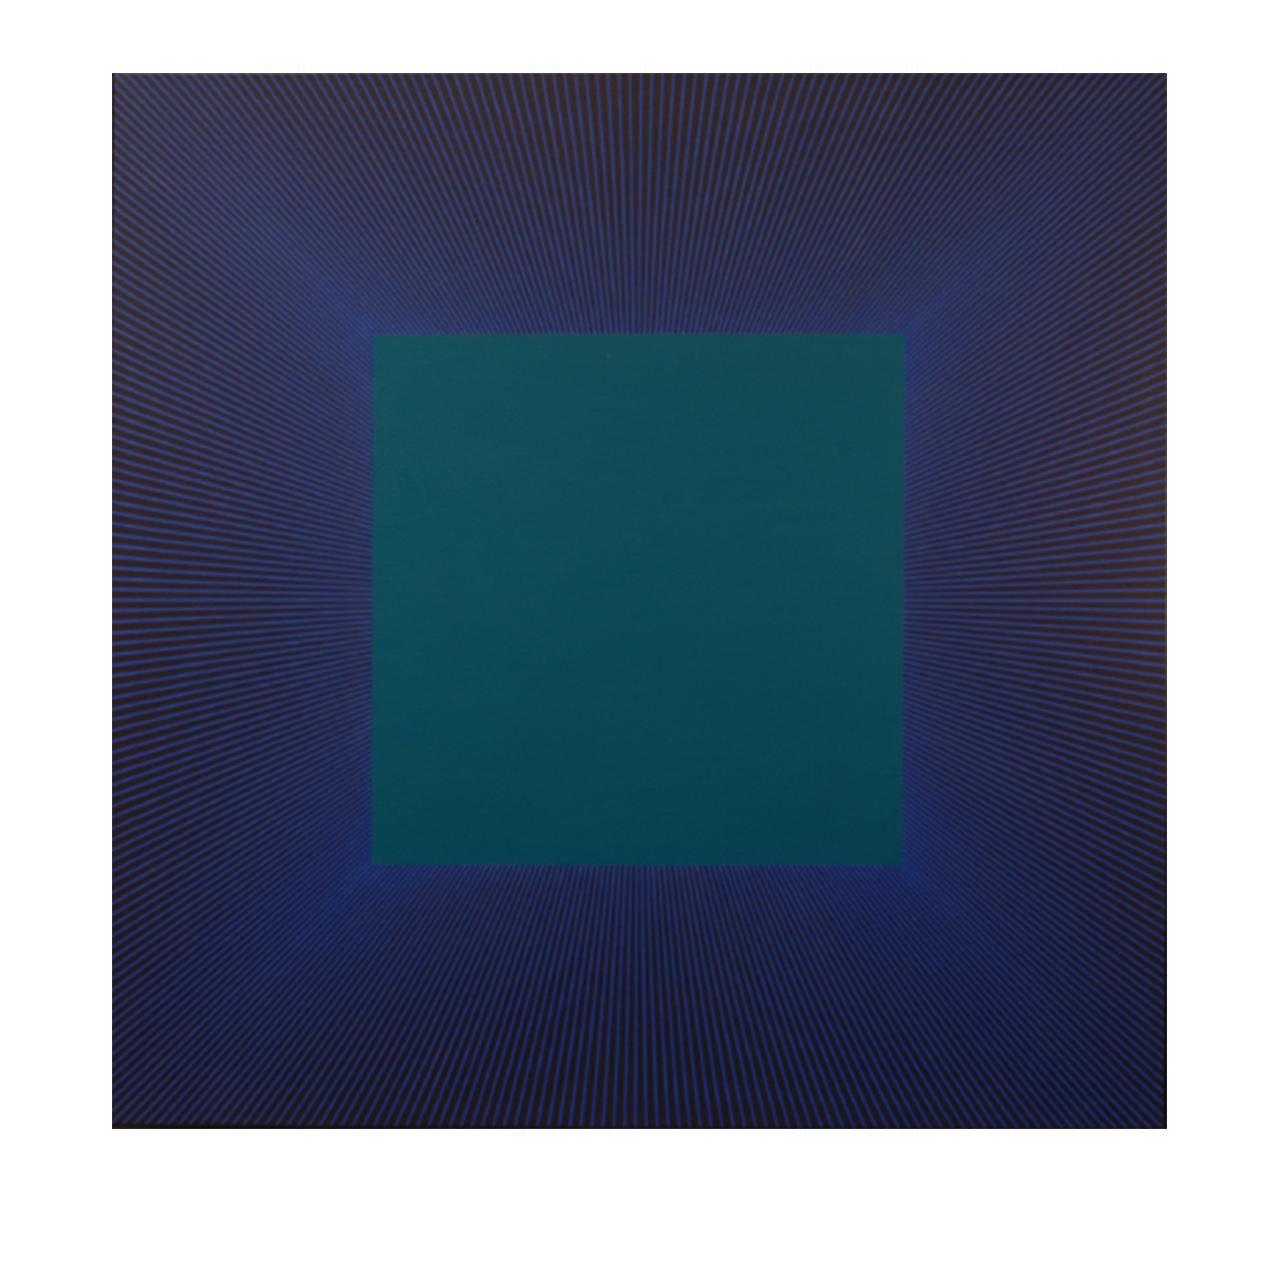 Centered Square 1017, 1981-2011